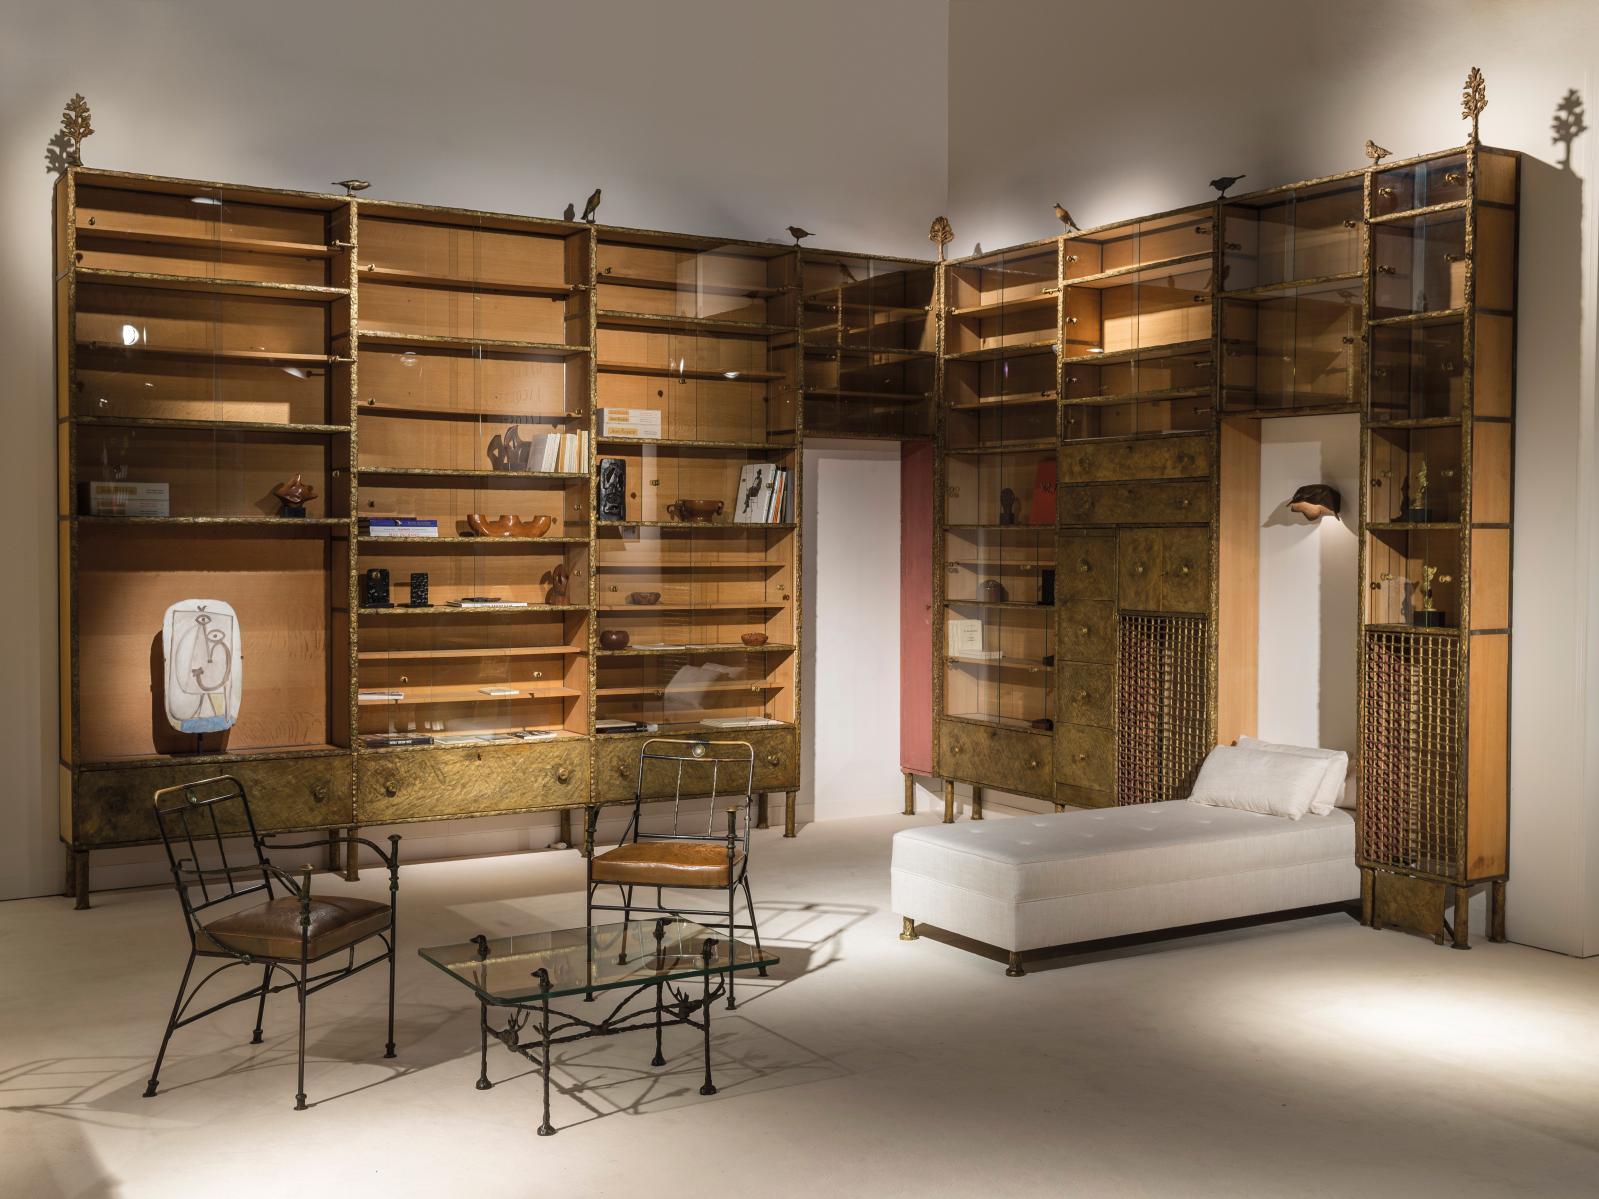 Chambre, vers 1969, ancienne collection Marc Barbezat.